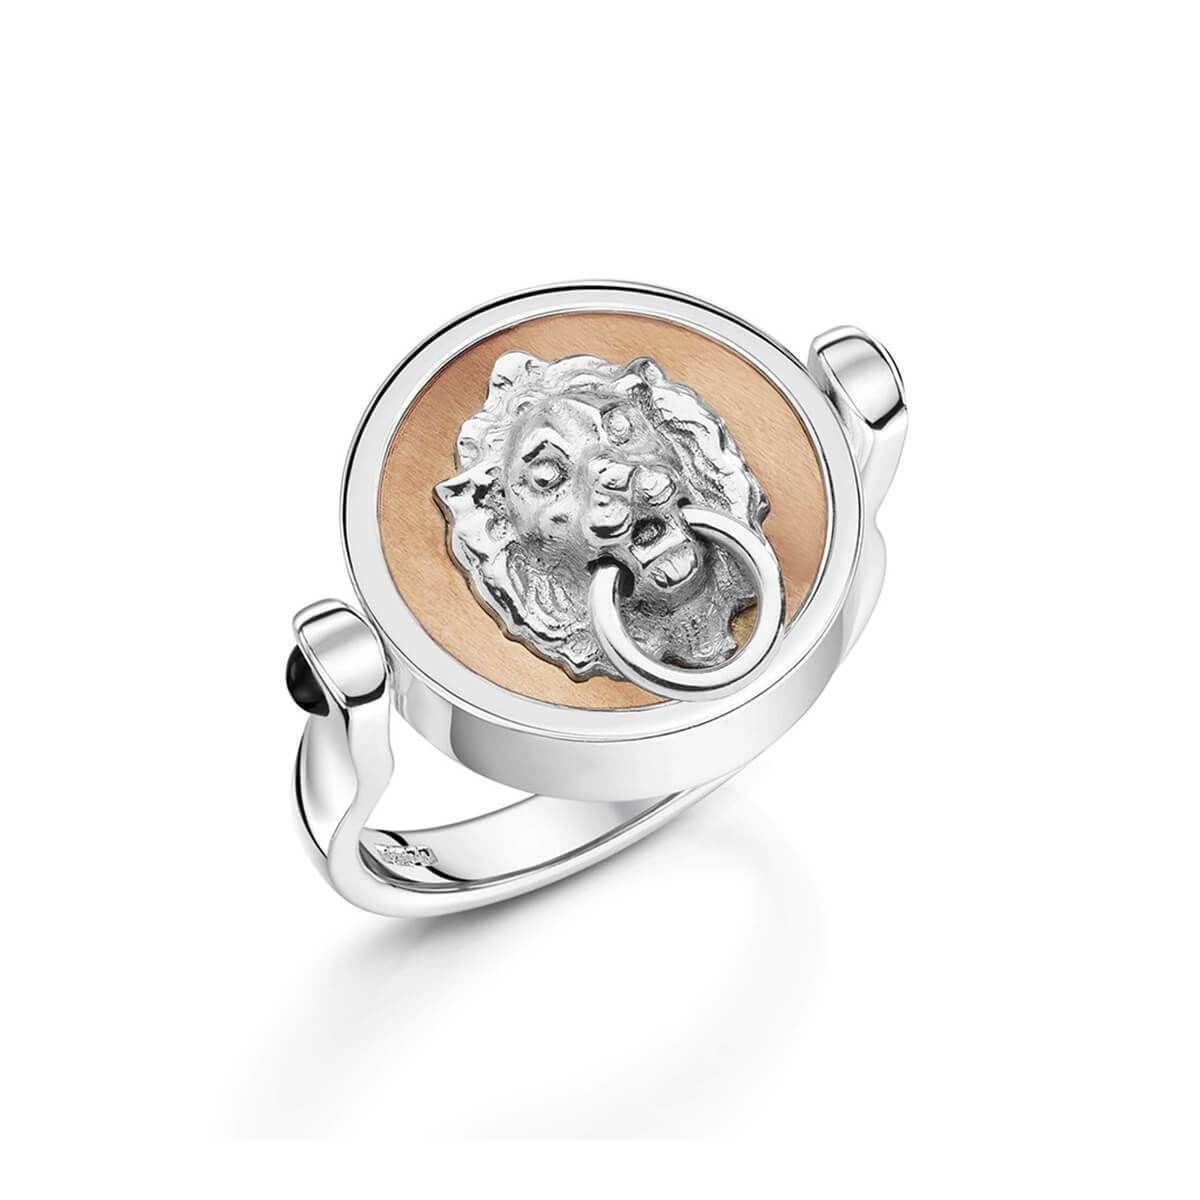 Interchangeable signet ring